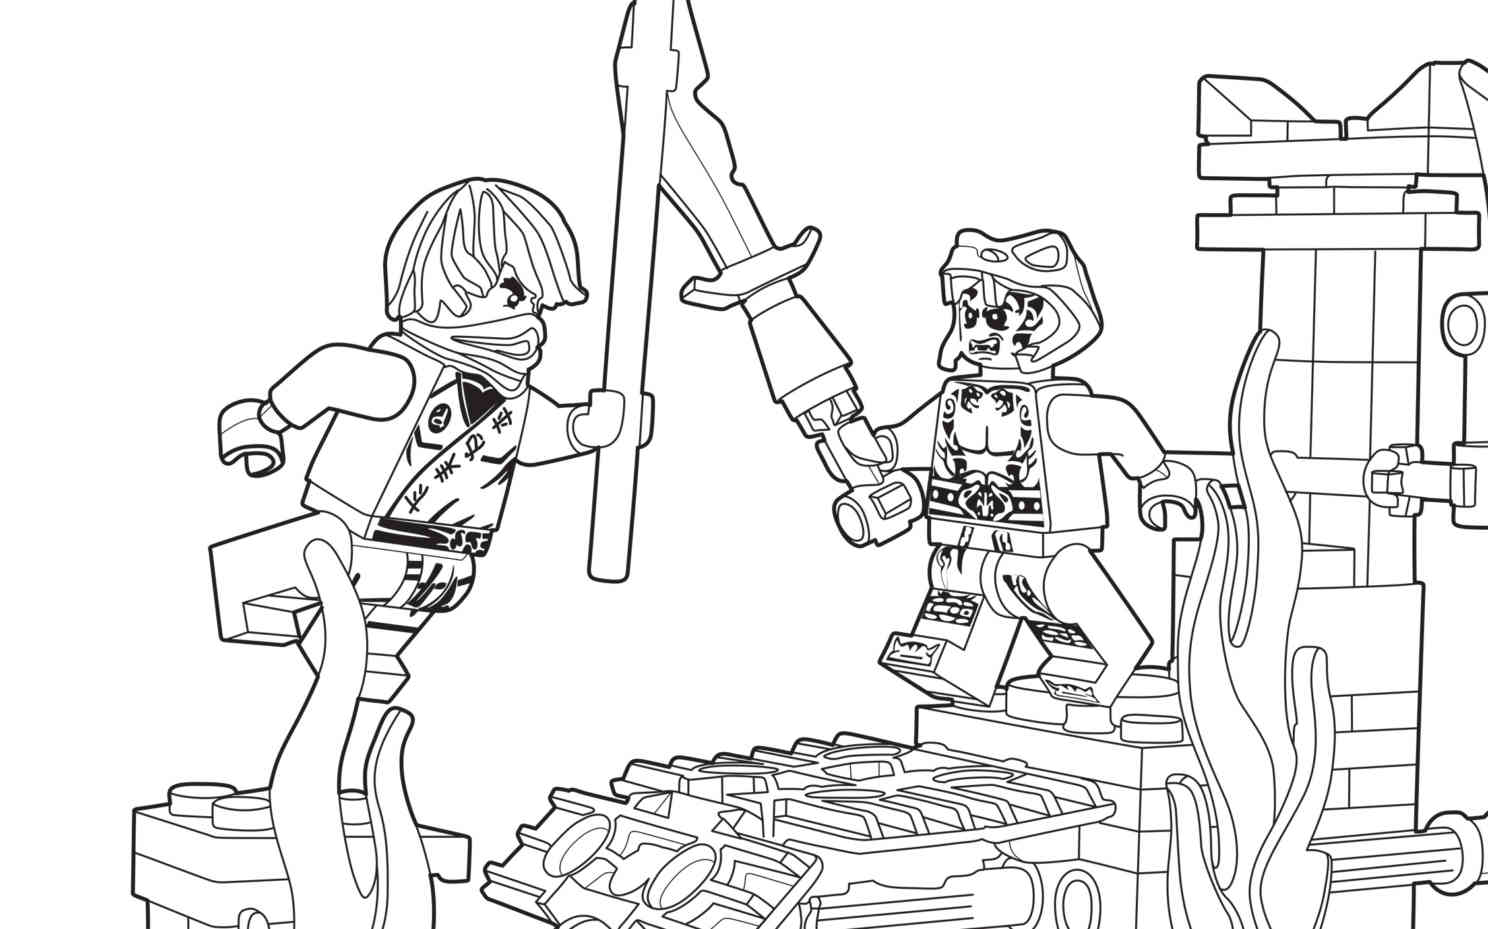 lego ninjago airjitzu coloring pages - photo#7